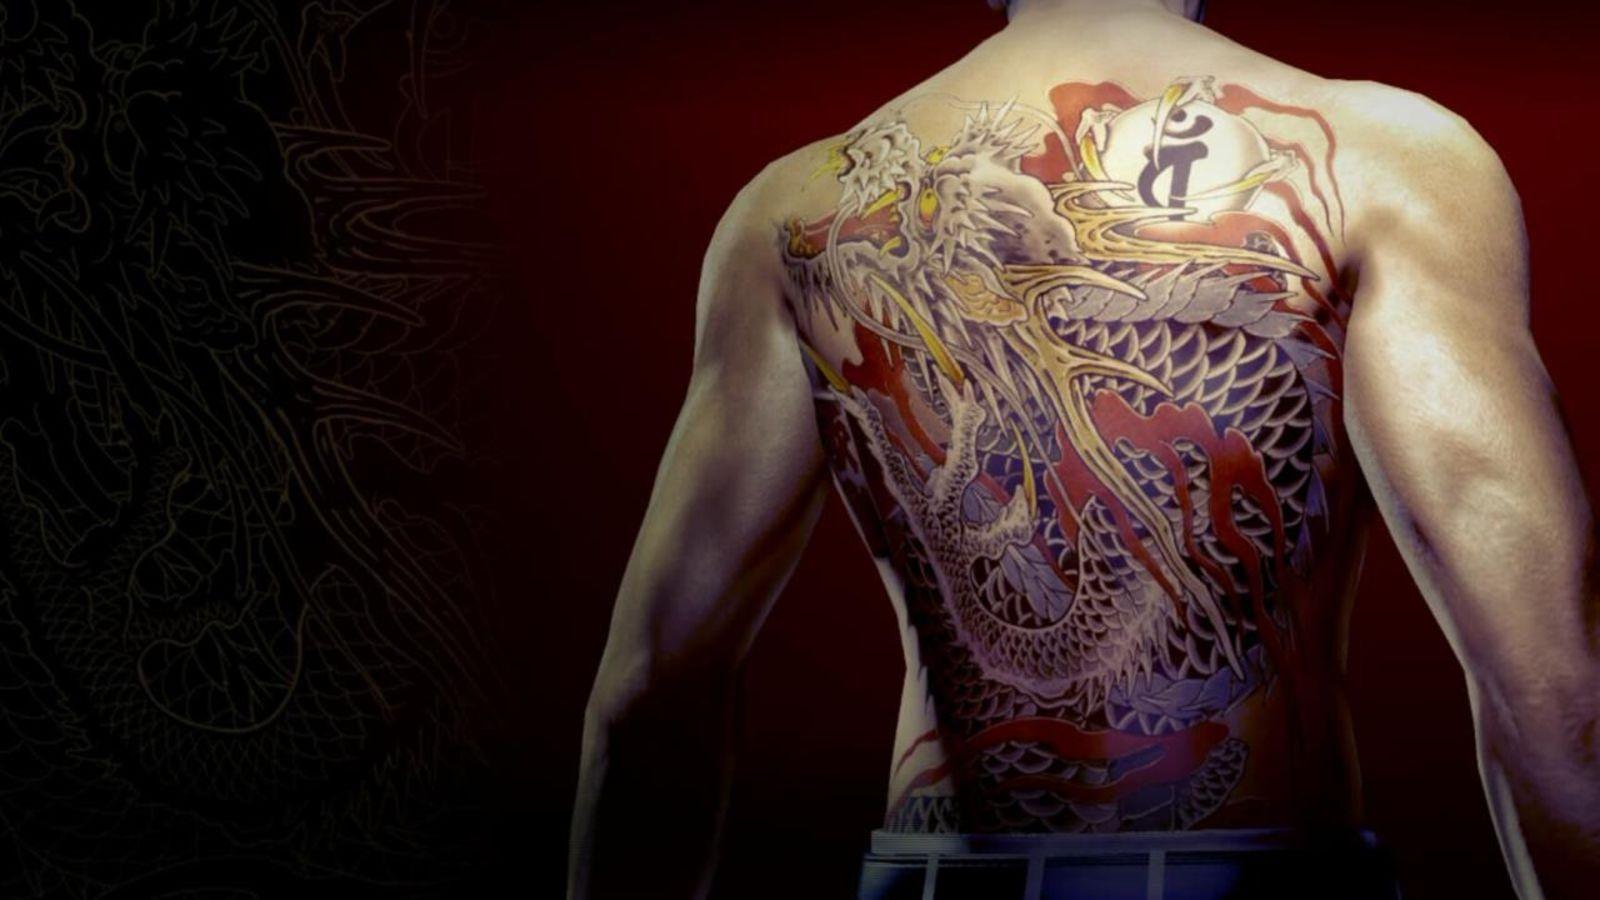 The Meaning Of Yakuza's Tattoos (With images) Yakuza